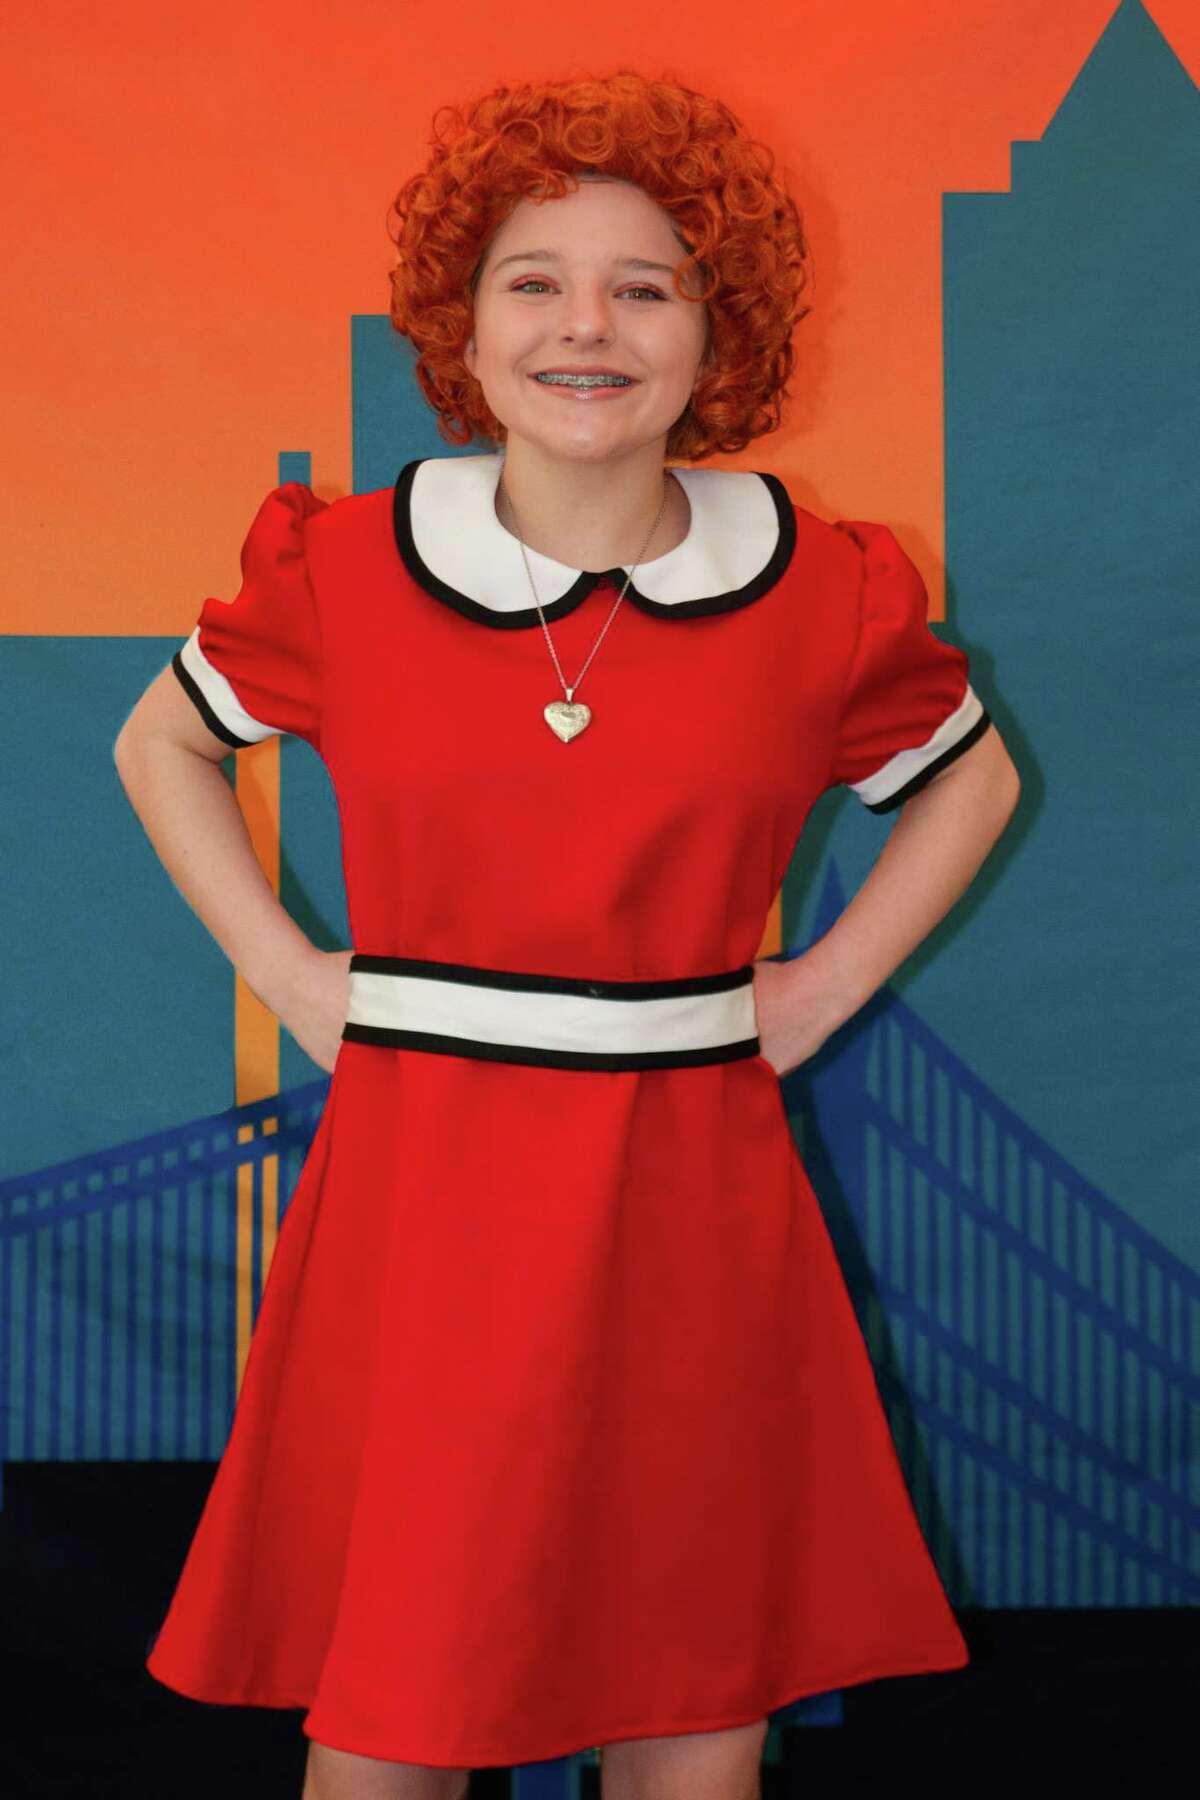 Oliva Hirsh as Annie in